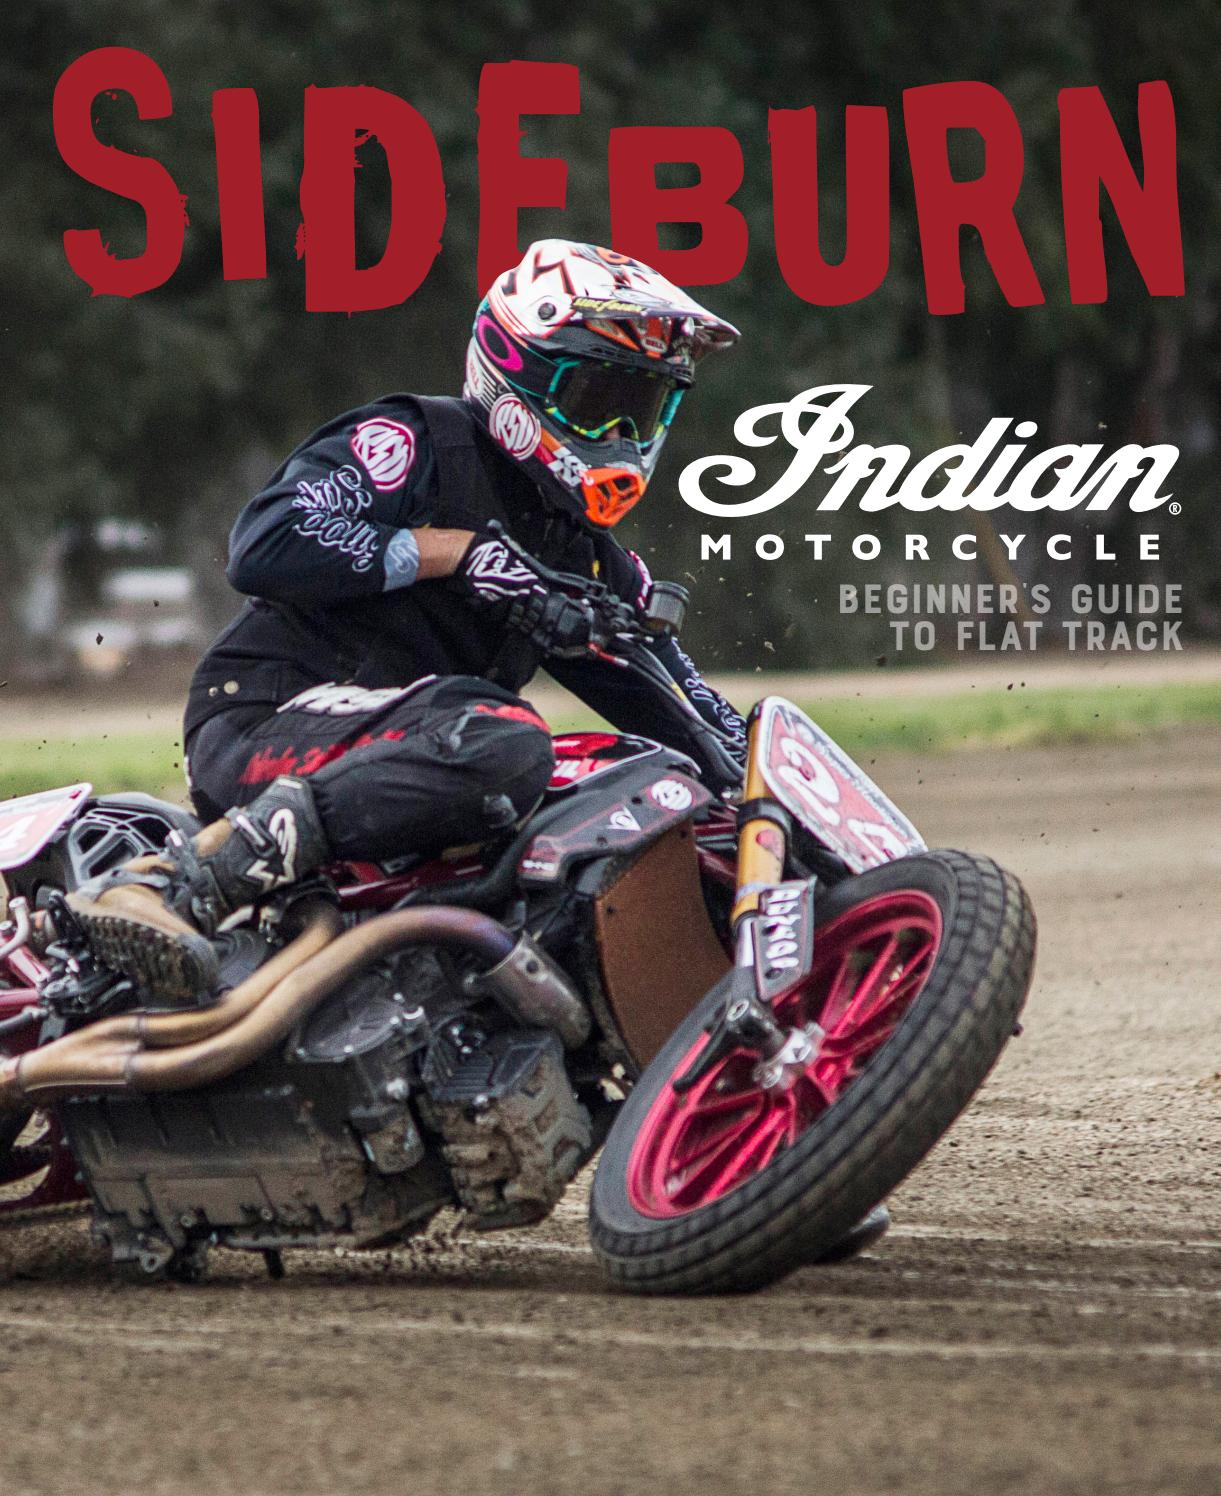 Sideburn X Indian Beginner S Guide To Flat Track By Sideburn Magazine Issuu